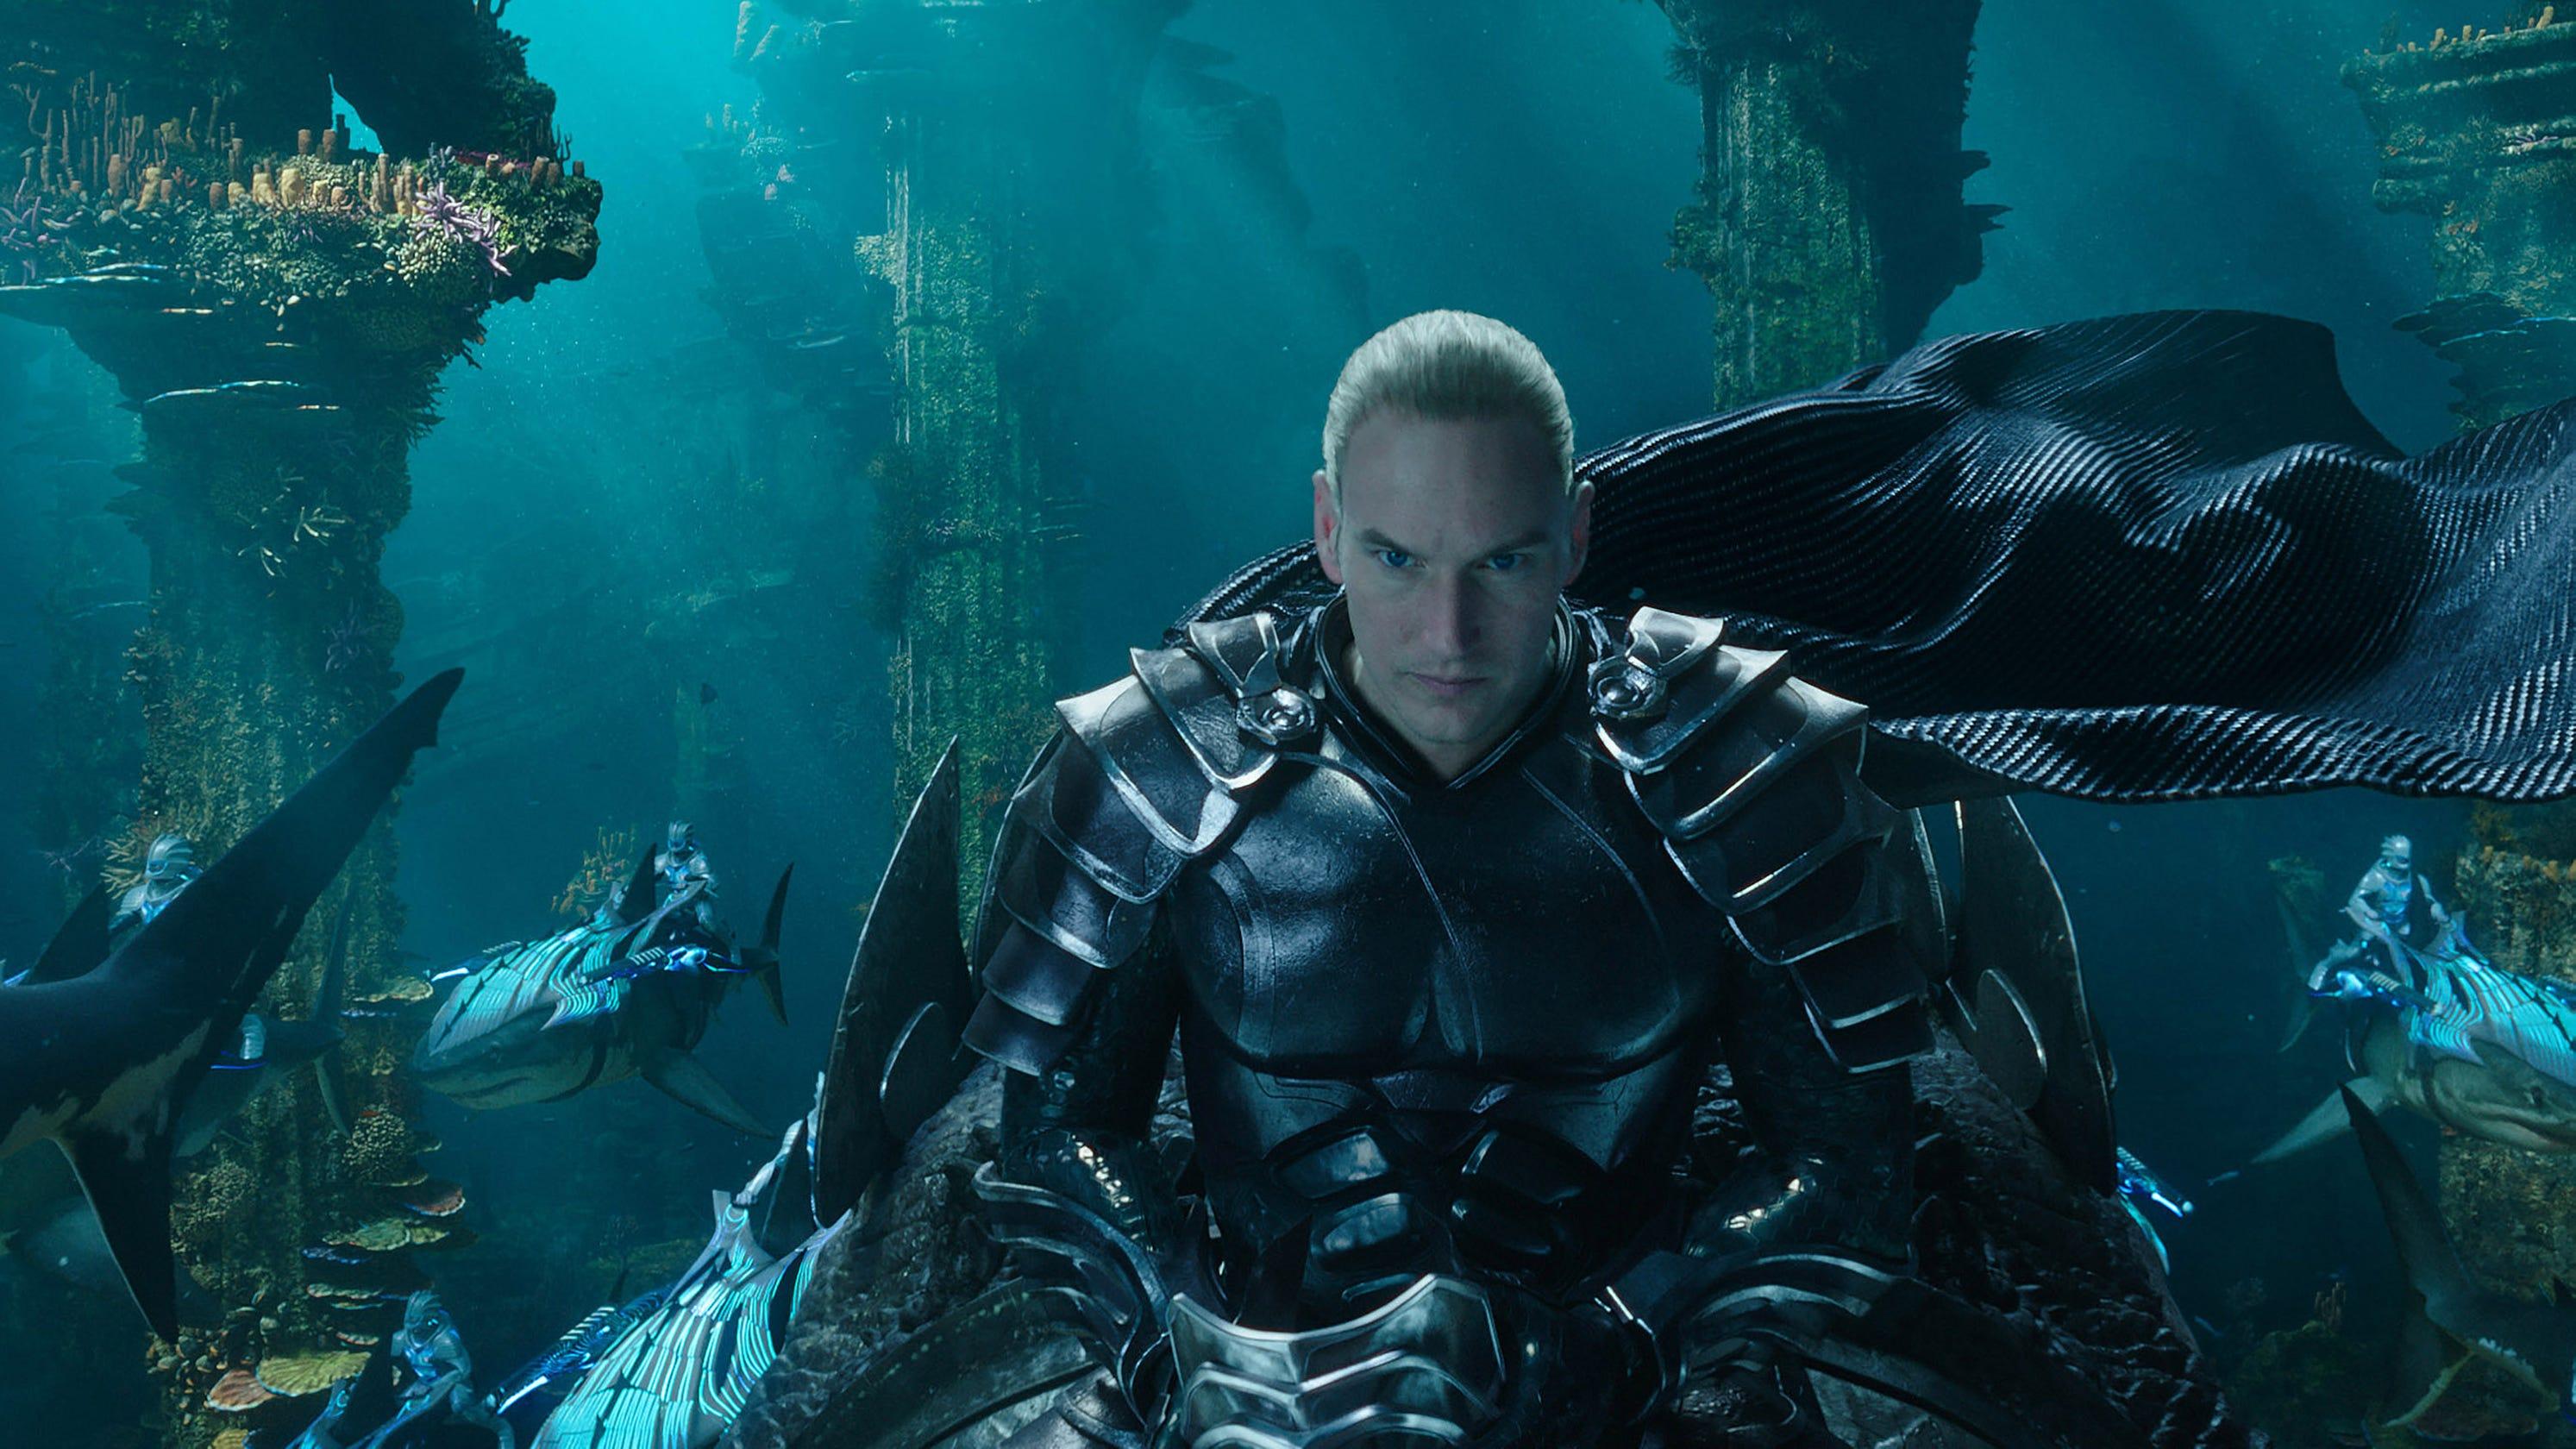 Jason Momoa Aquaman Movie Poster Coloring M